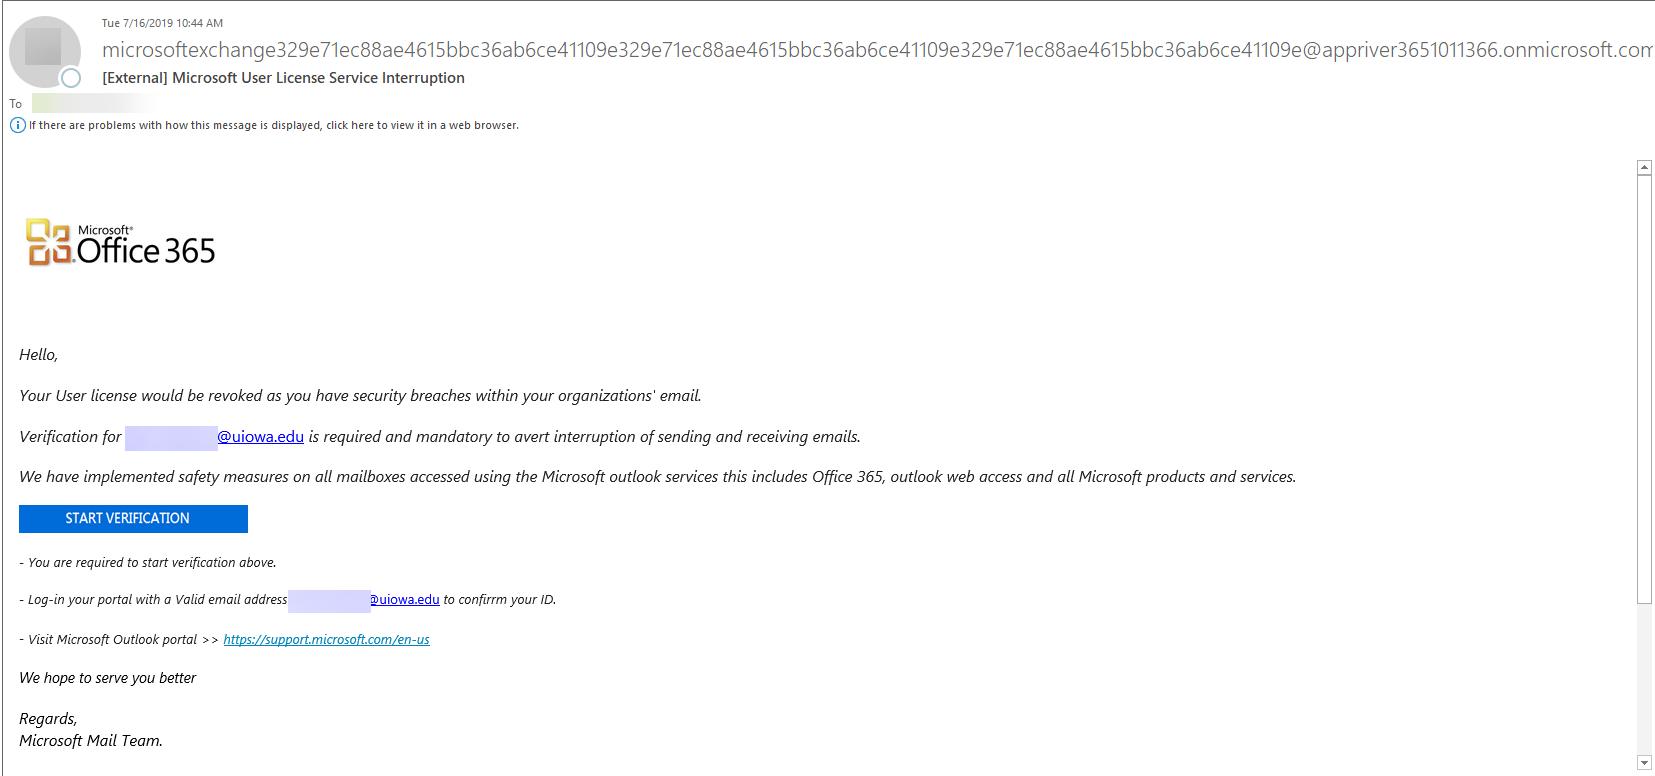 microsoft user license interupption